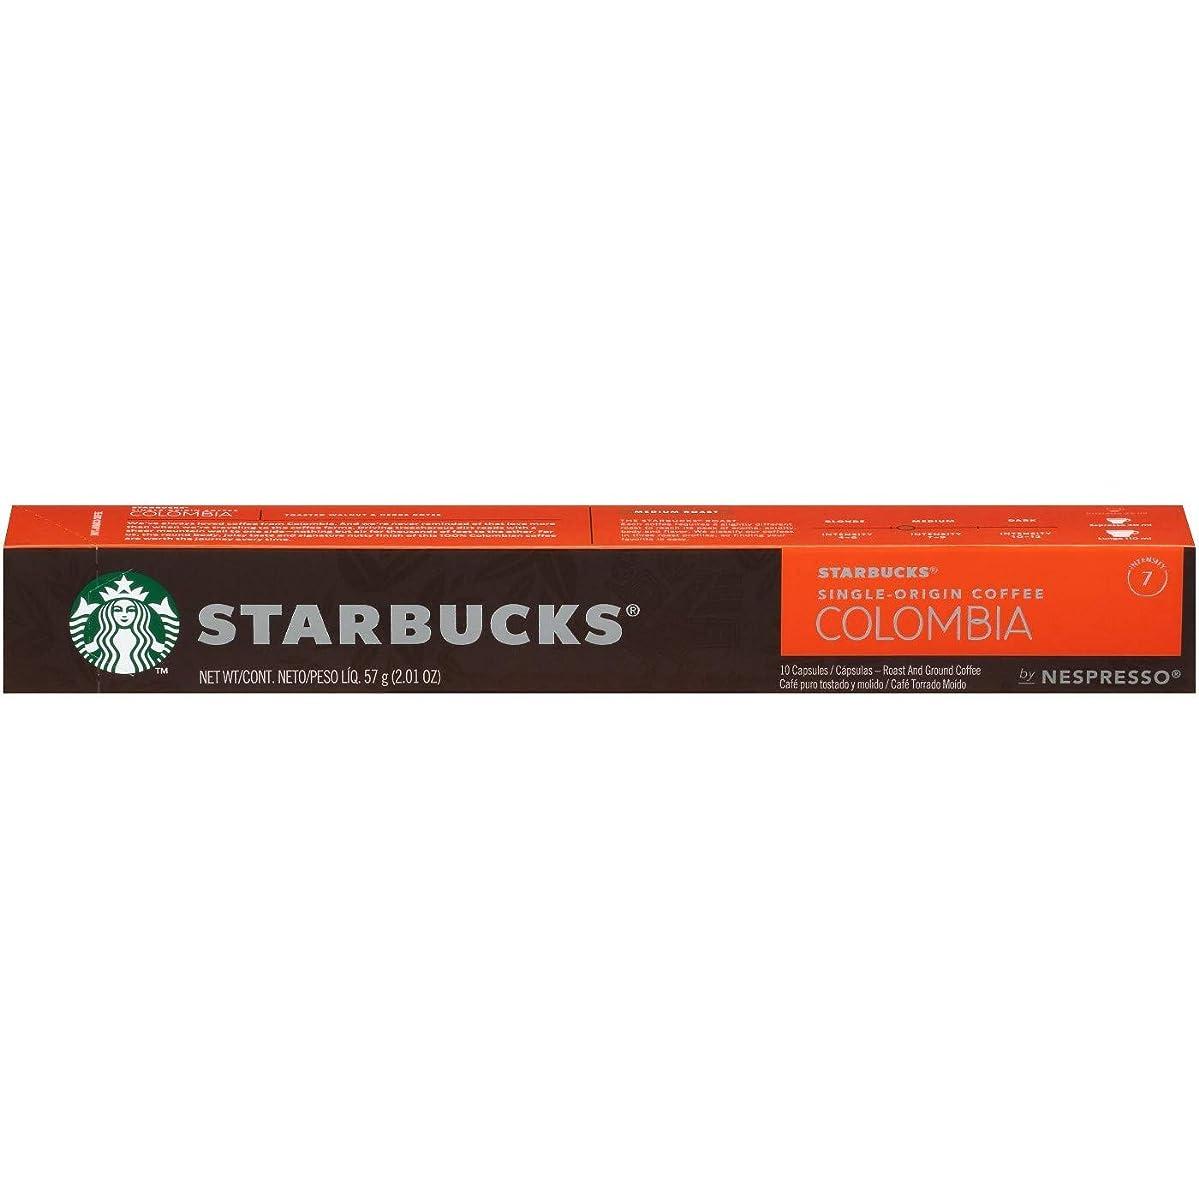 Starbucks Nespresso Columbia Espresso Roast Coffee Pods 10 pods, pack of 1 oesvdvpvyty3